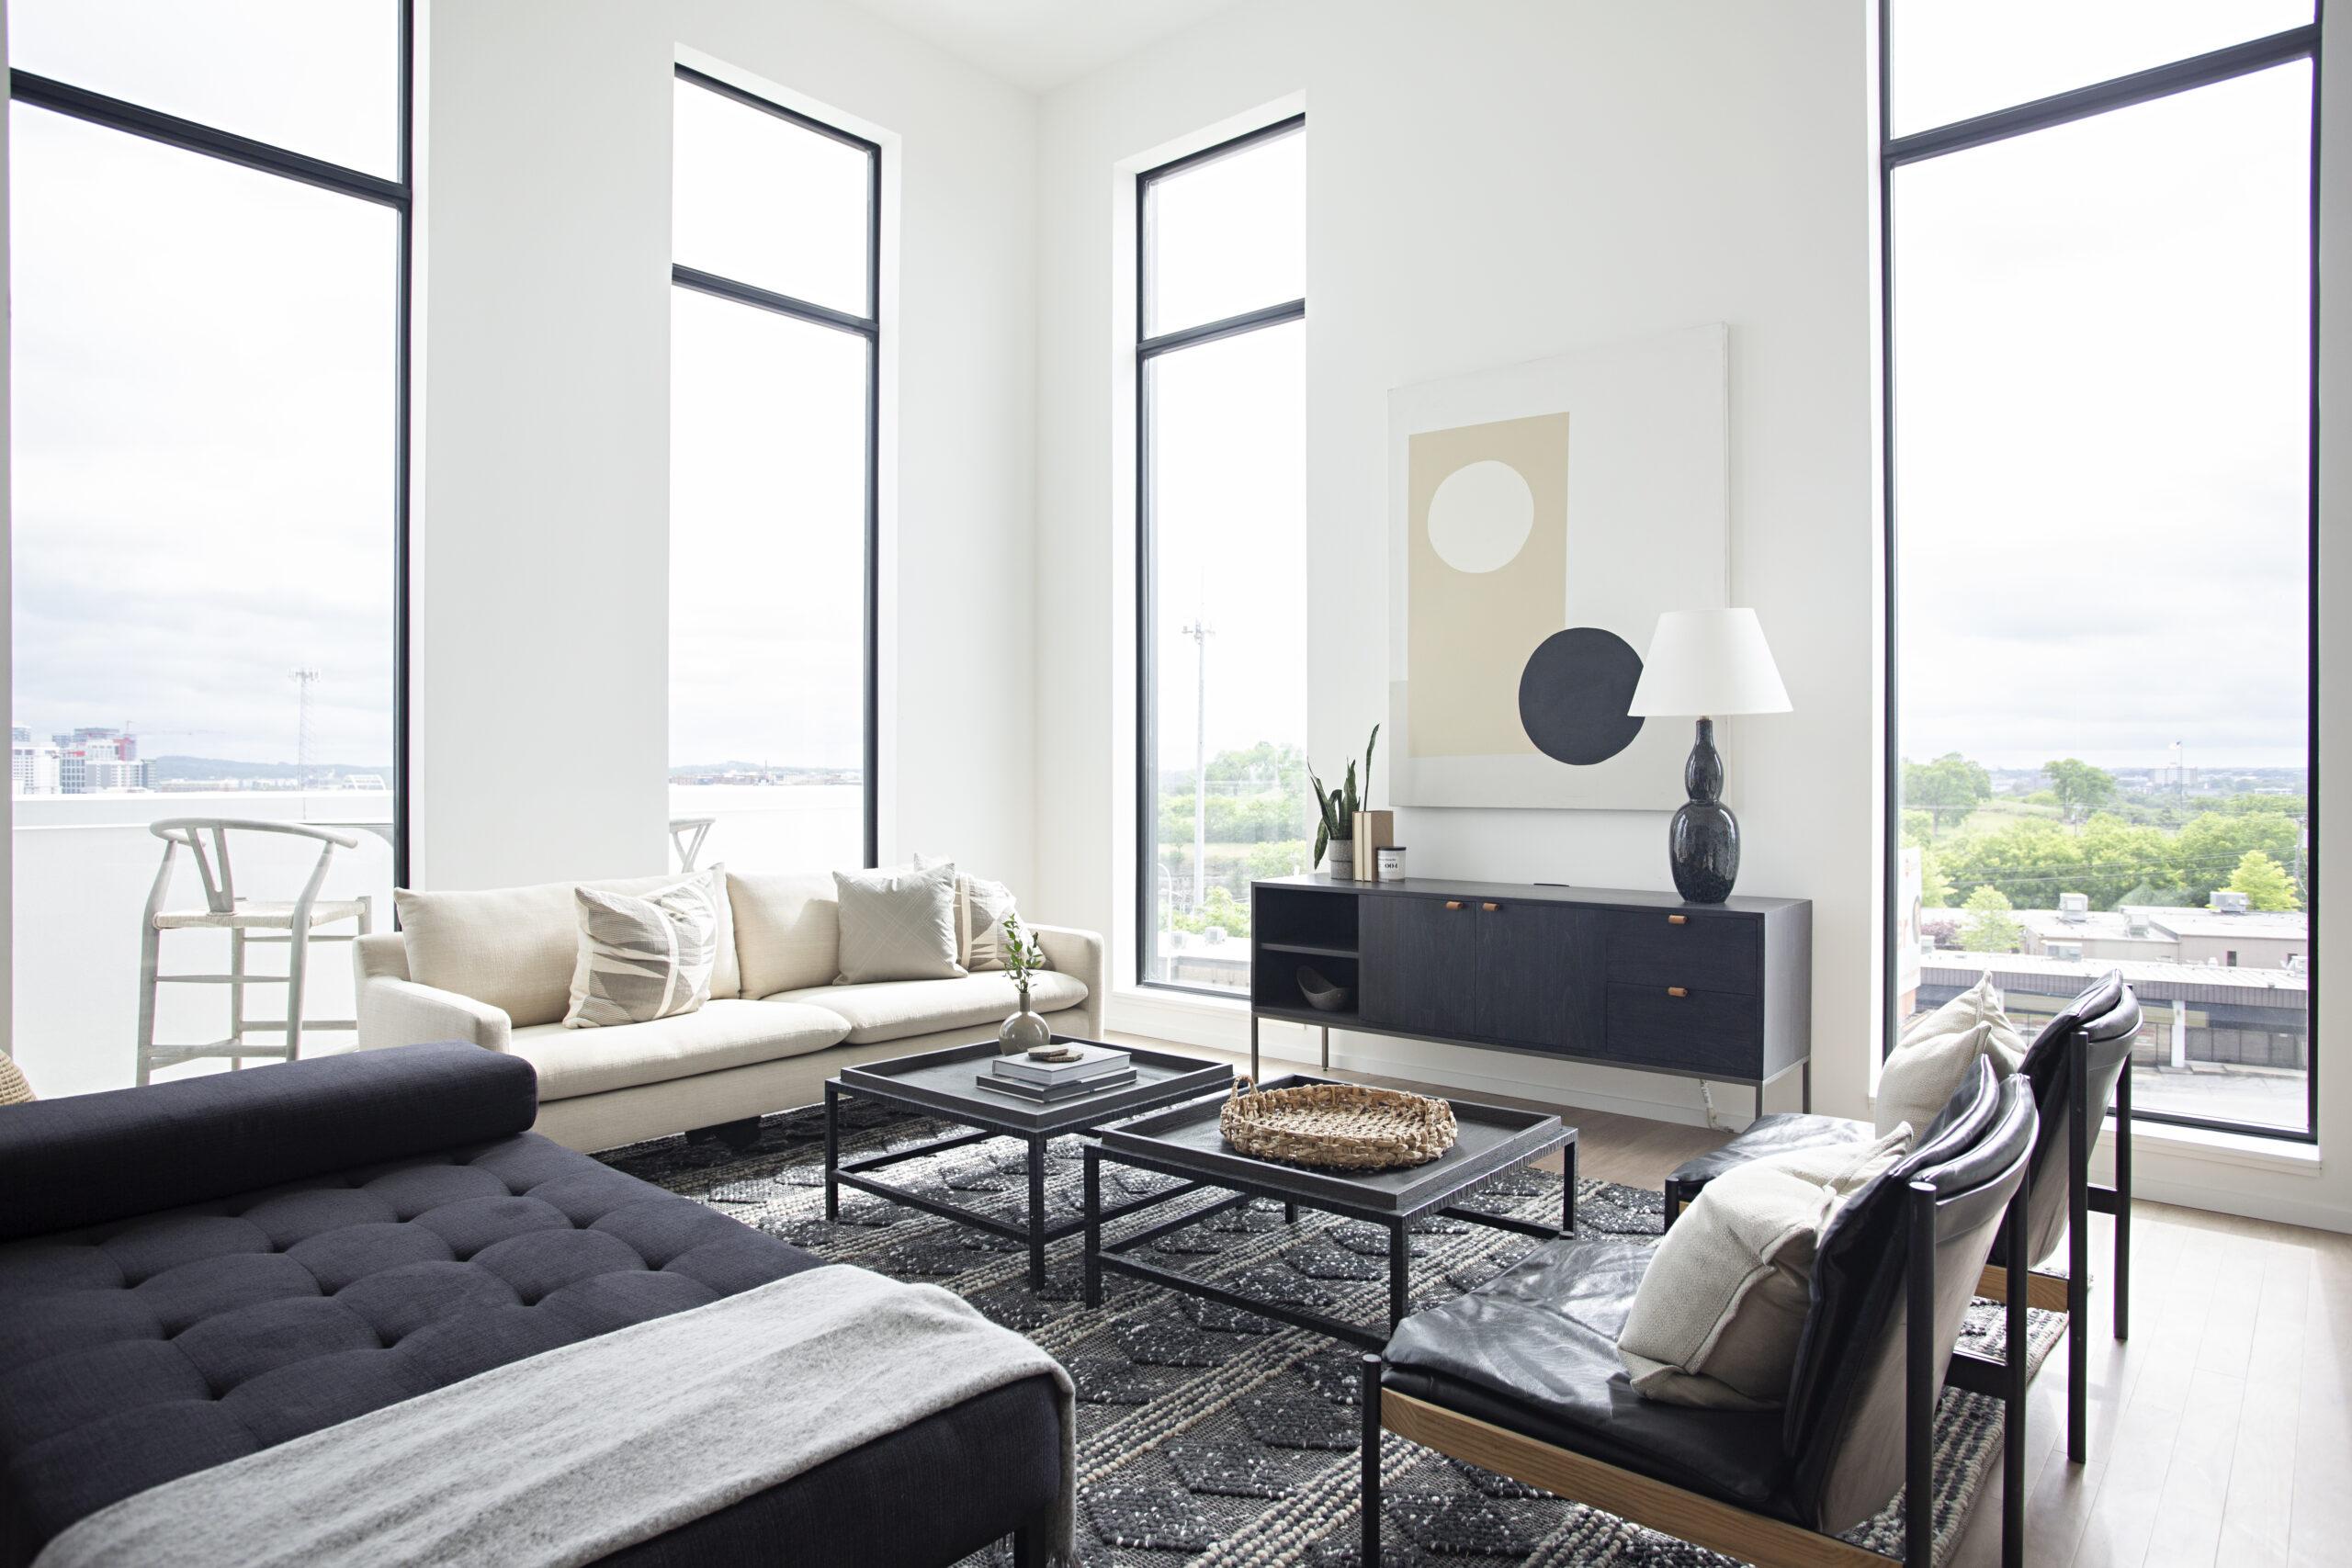 12-Mayker-Interiors-Home-Staging-Furniture-Rentals-Modern-Design-Decor-Nashville-Alina-Model-Unit